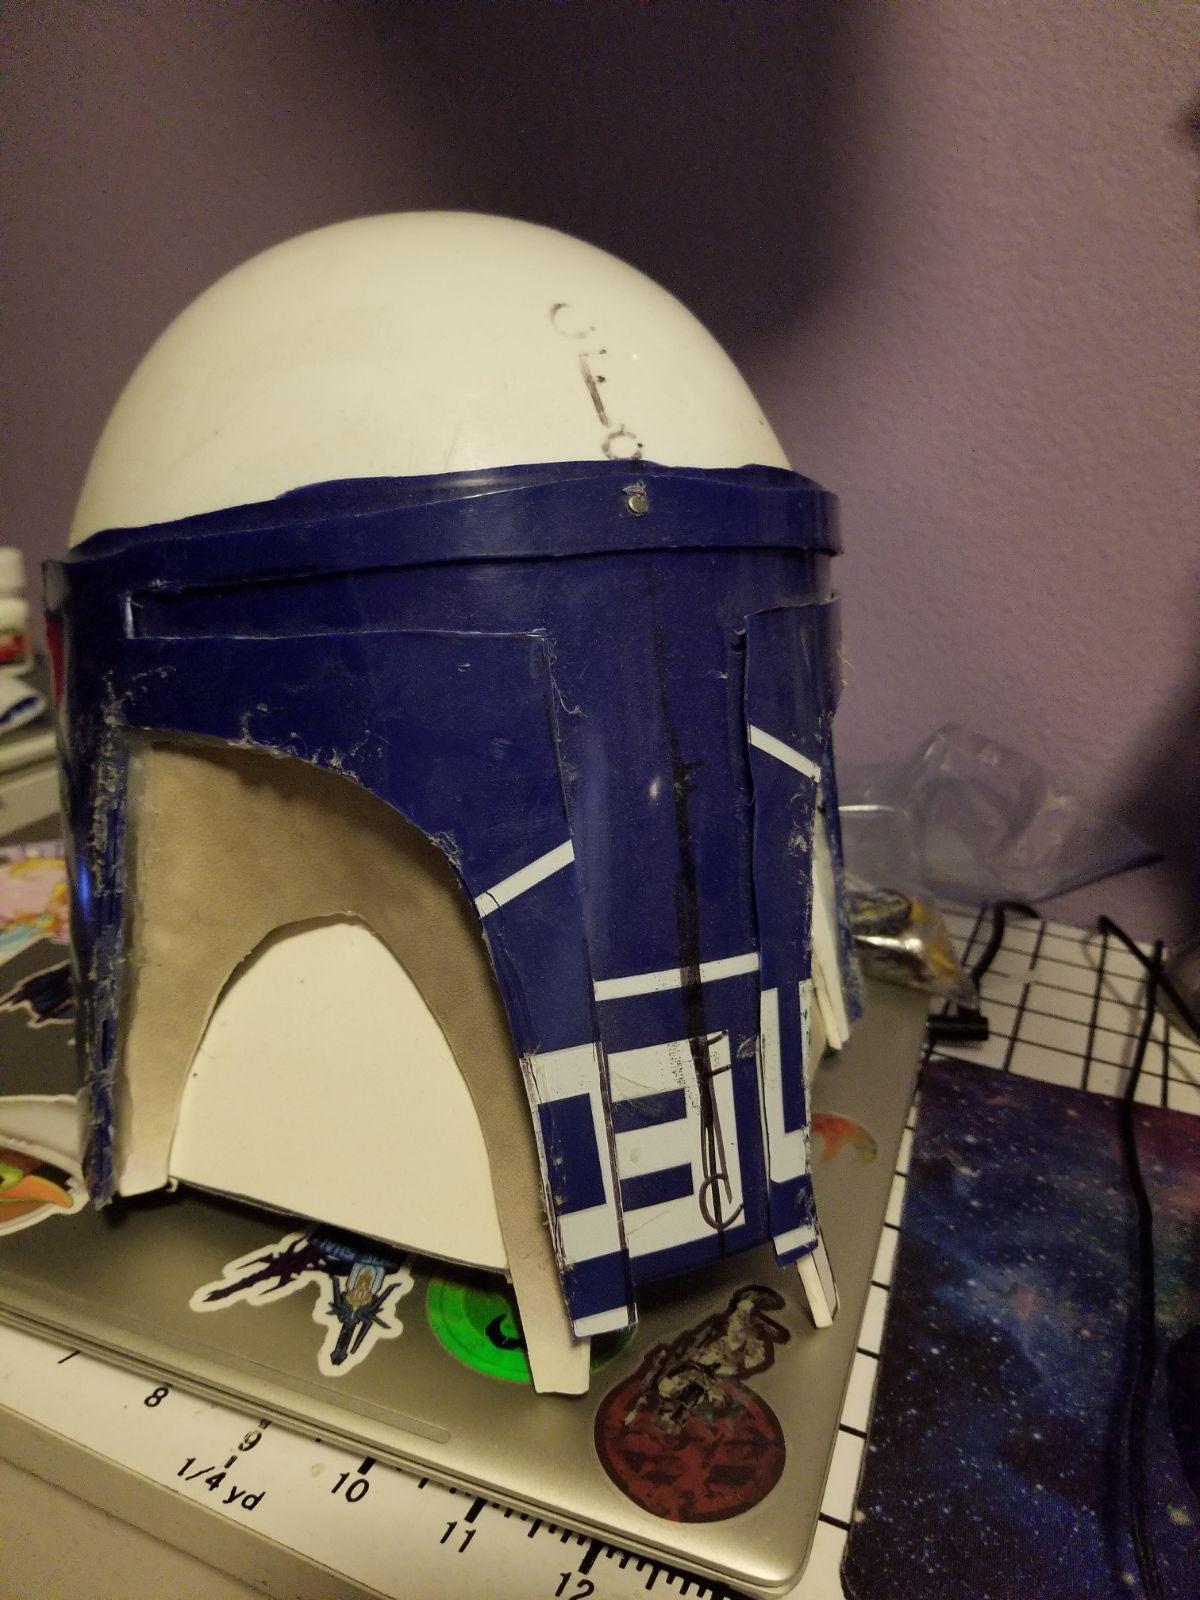 Work in Progress Mandalorian Helmet